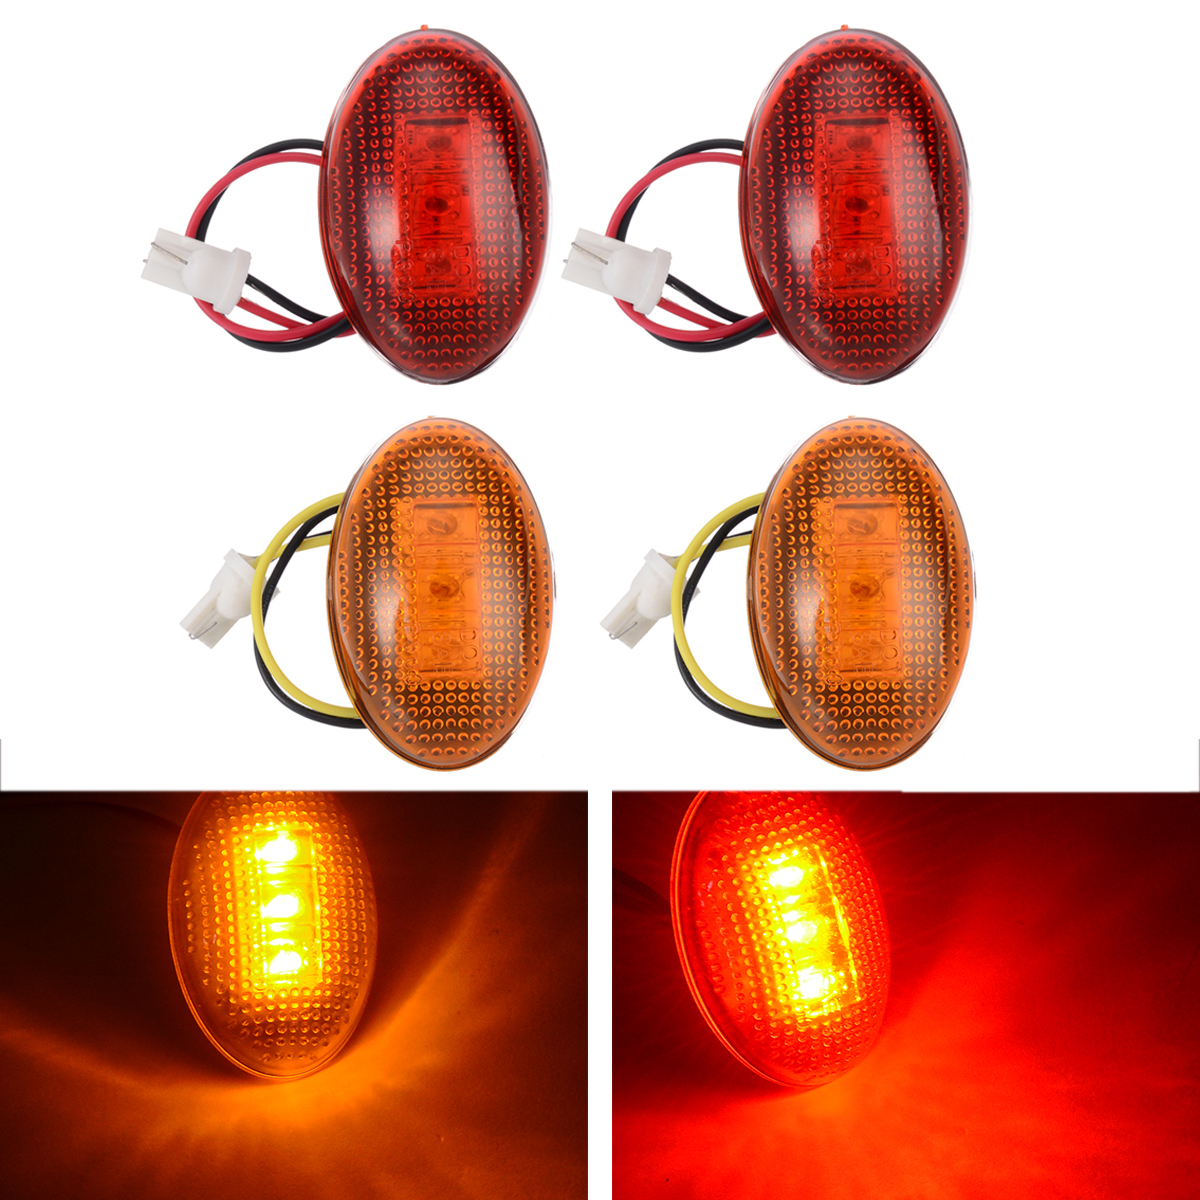 2 Pair 12V Front Rear Fender Side Marker Light 3LED Car Signal Lamp 8C3Z-15442-B Amber+Red For Ford F350 1999-2010